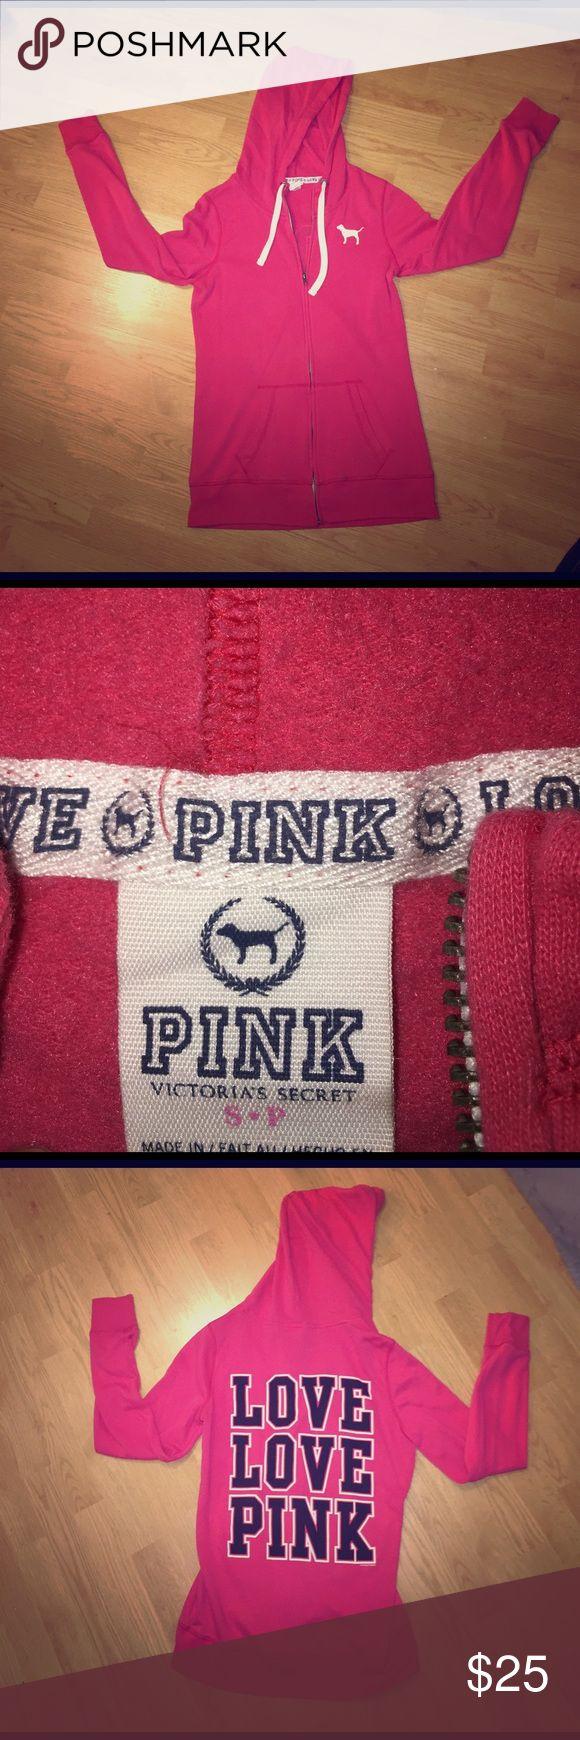 Hot pink PINK zip up jacket Small hot pink PINK jacket hardly worn PINK Victoria's Secret Jackets & Coats